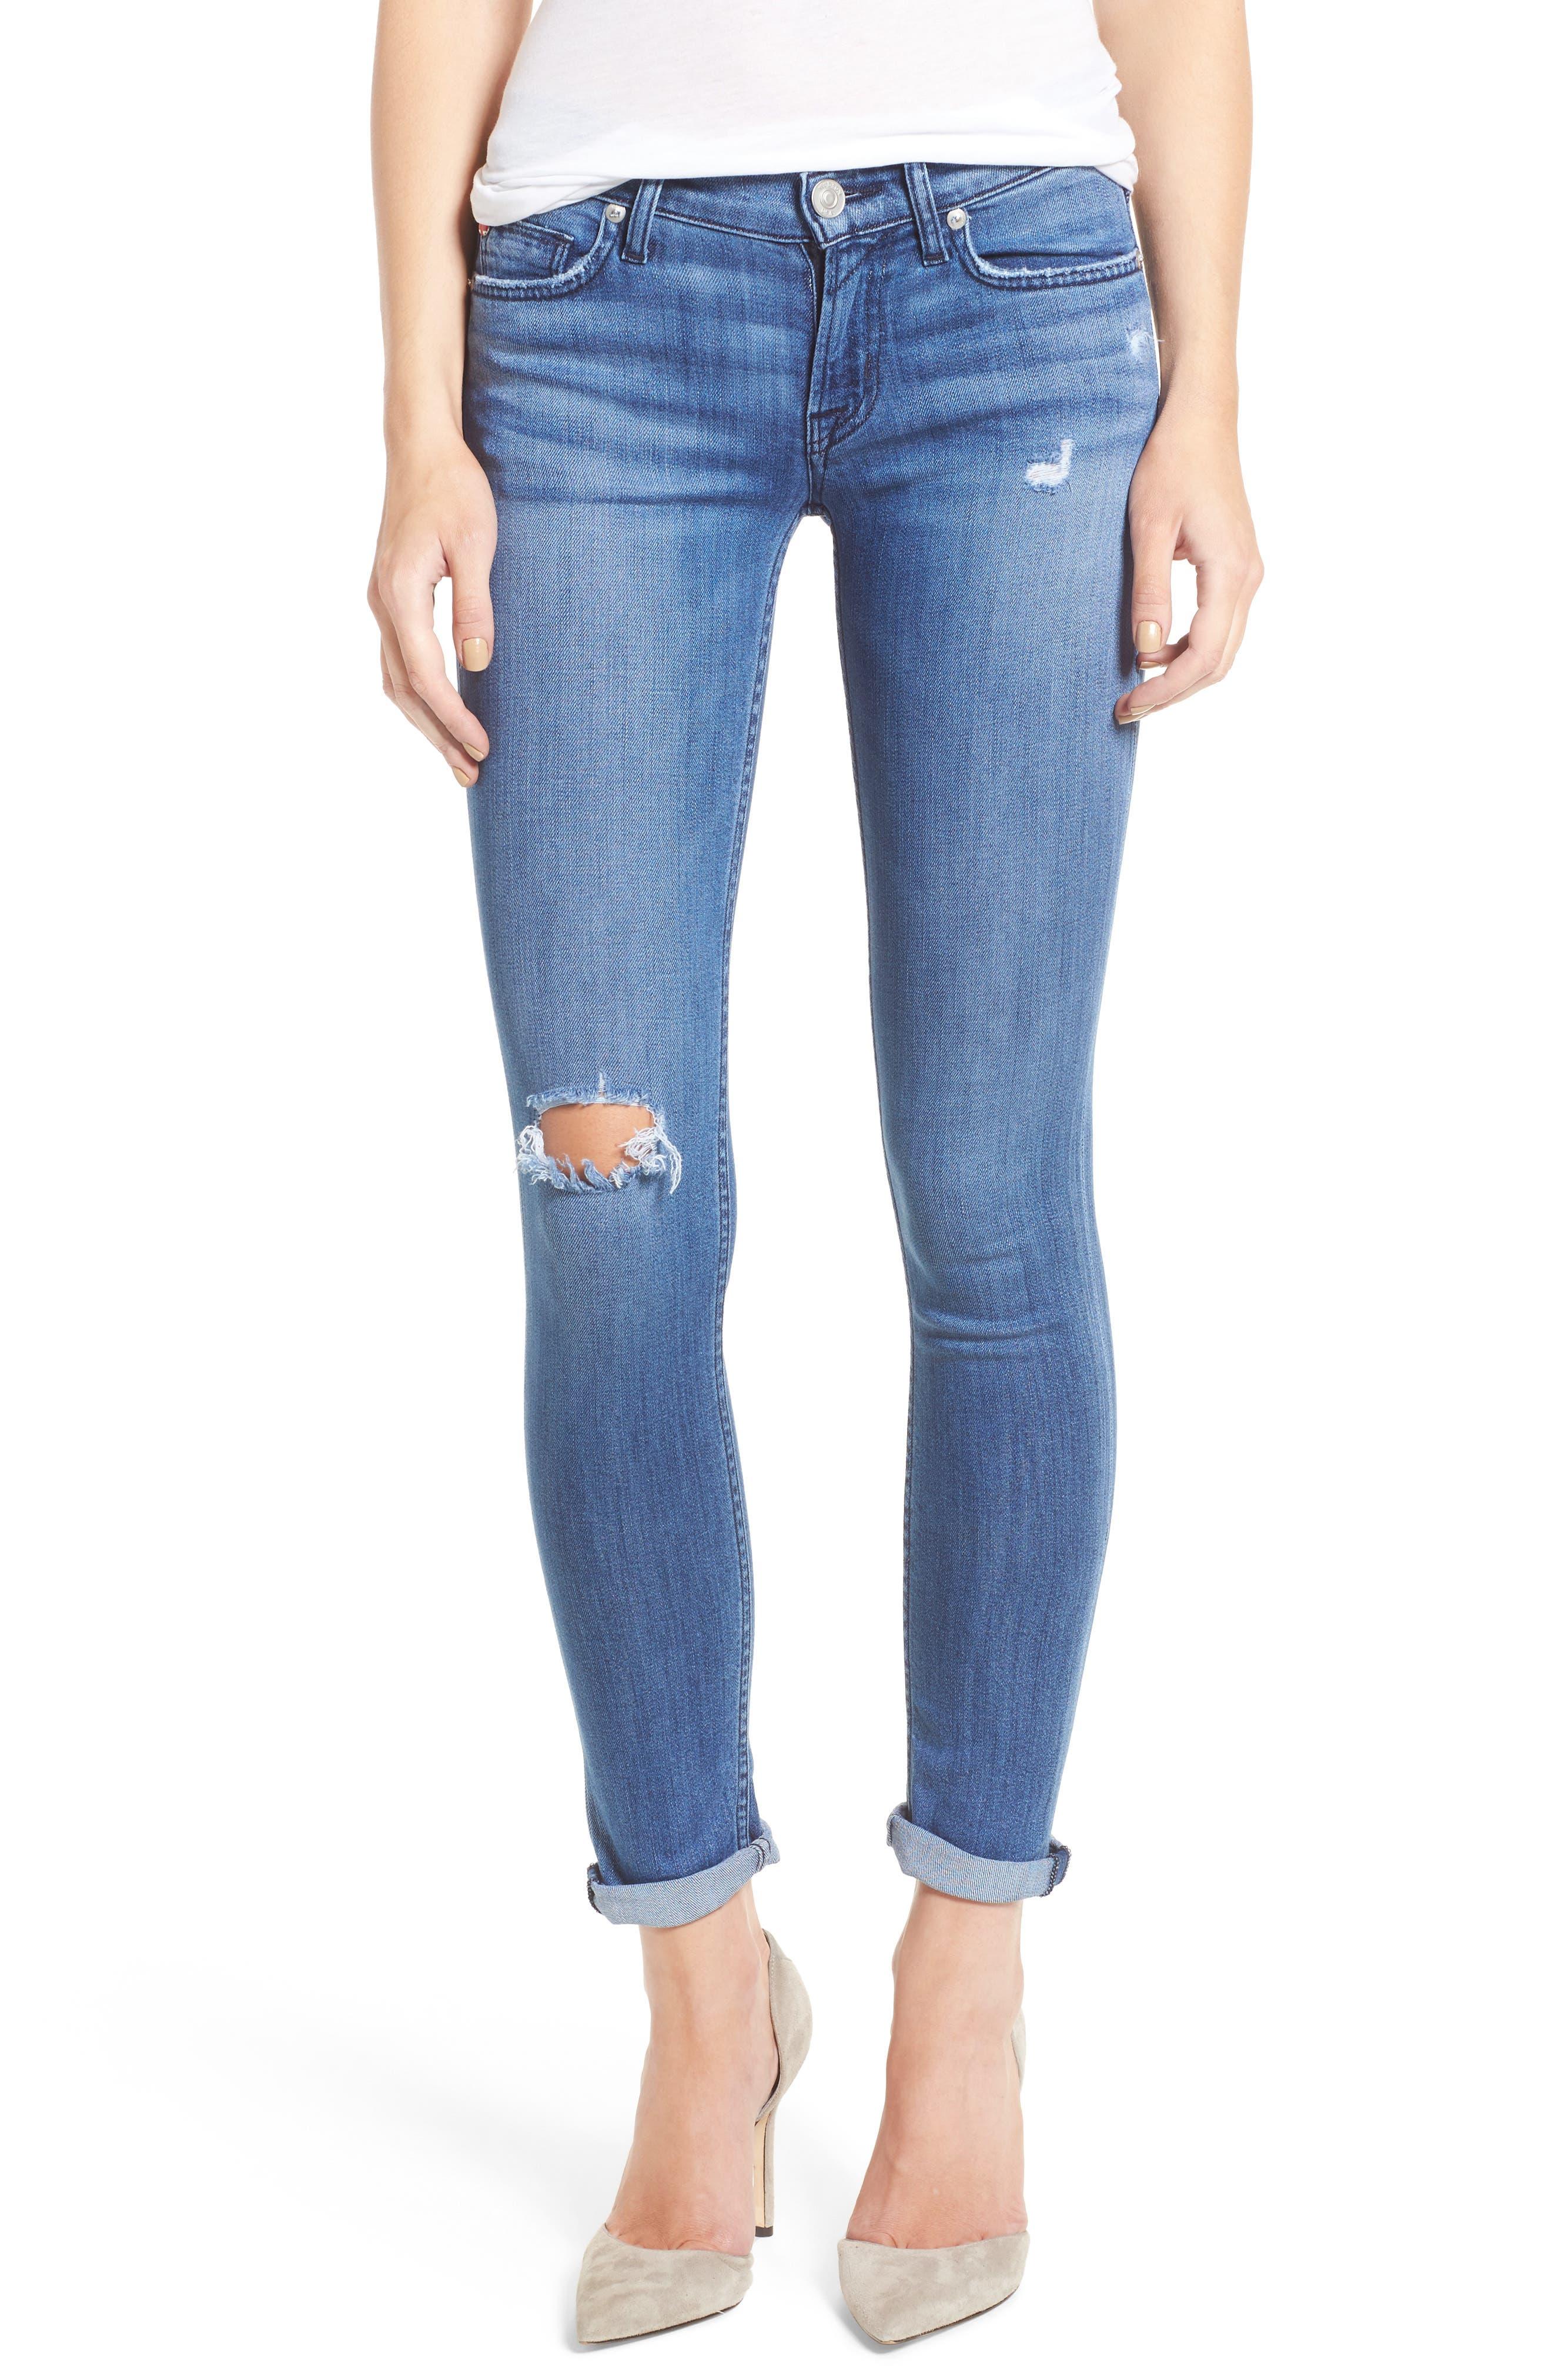 Alternate Image 1 Selected - Hudson Tally Crop Skinny Jeans (Encounter)